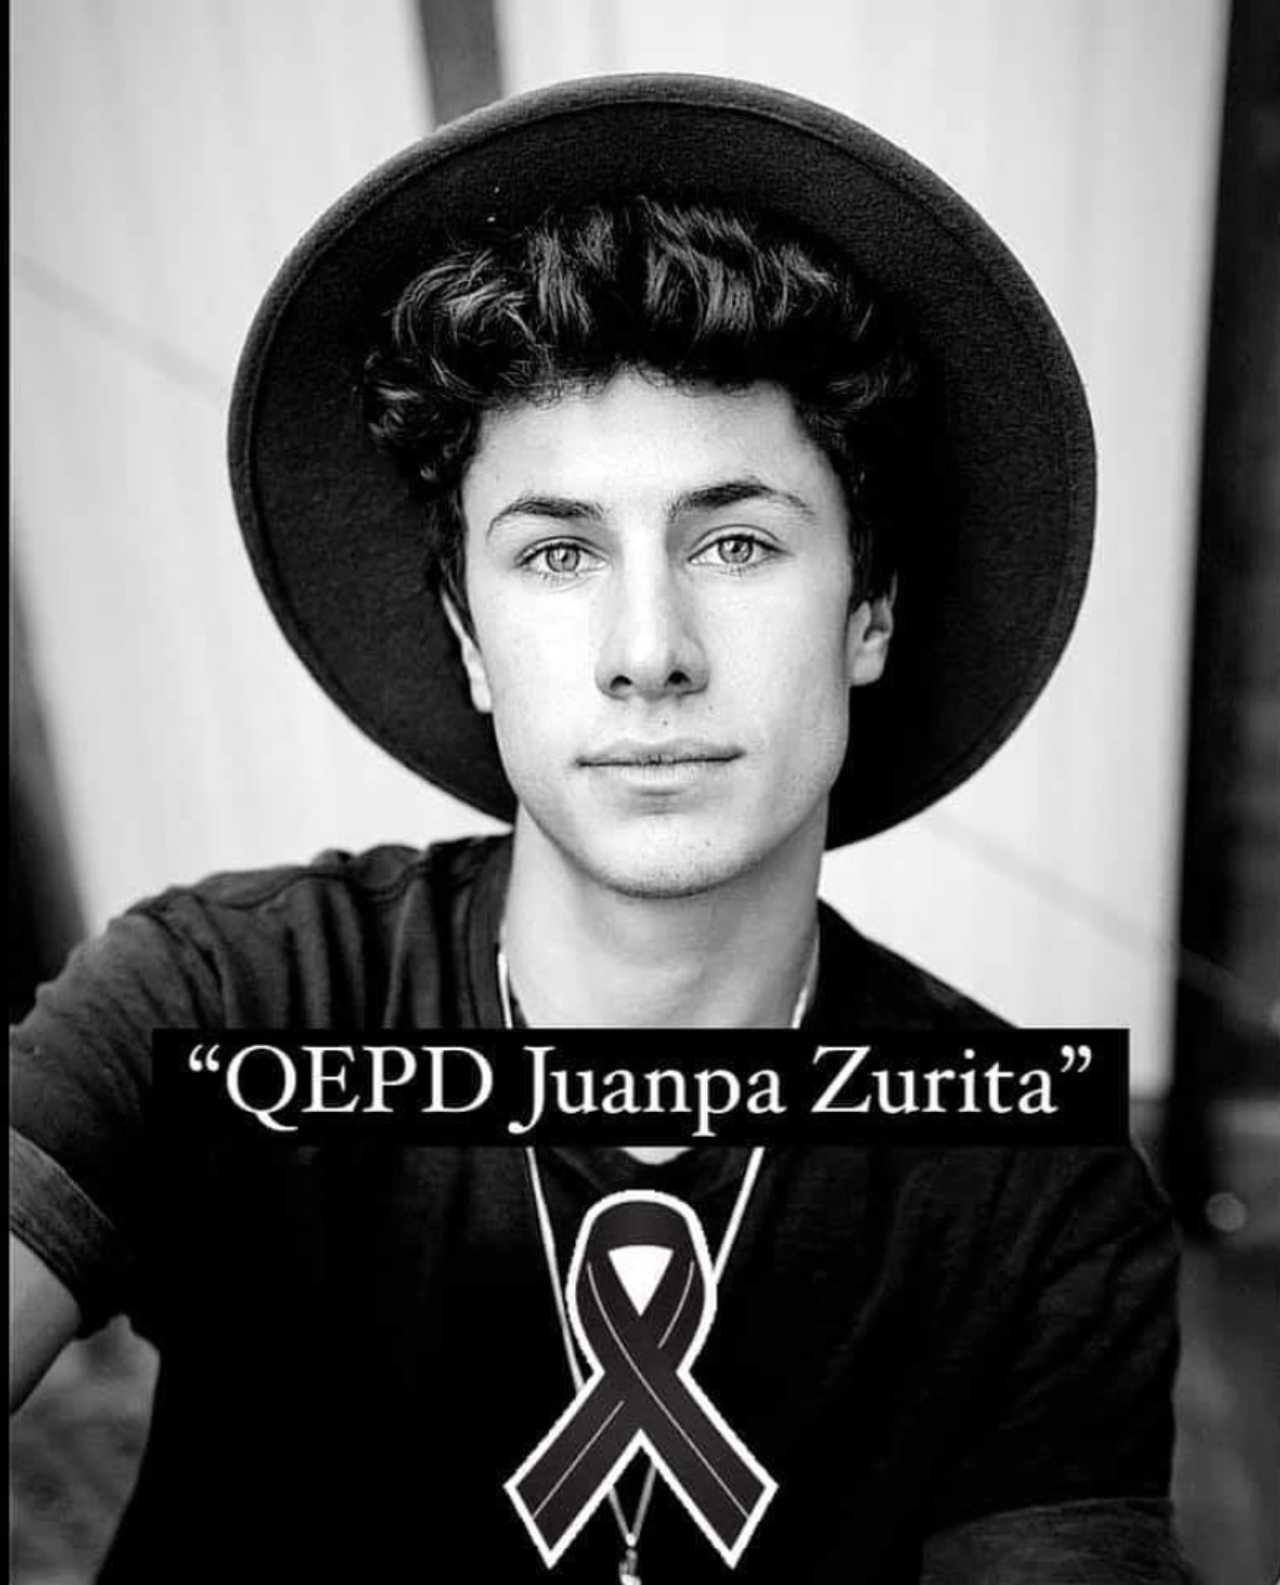 Meme de la muerte de Juanpa Zurita